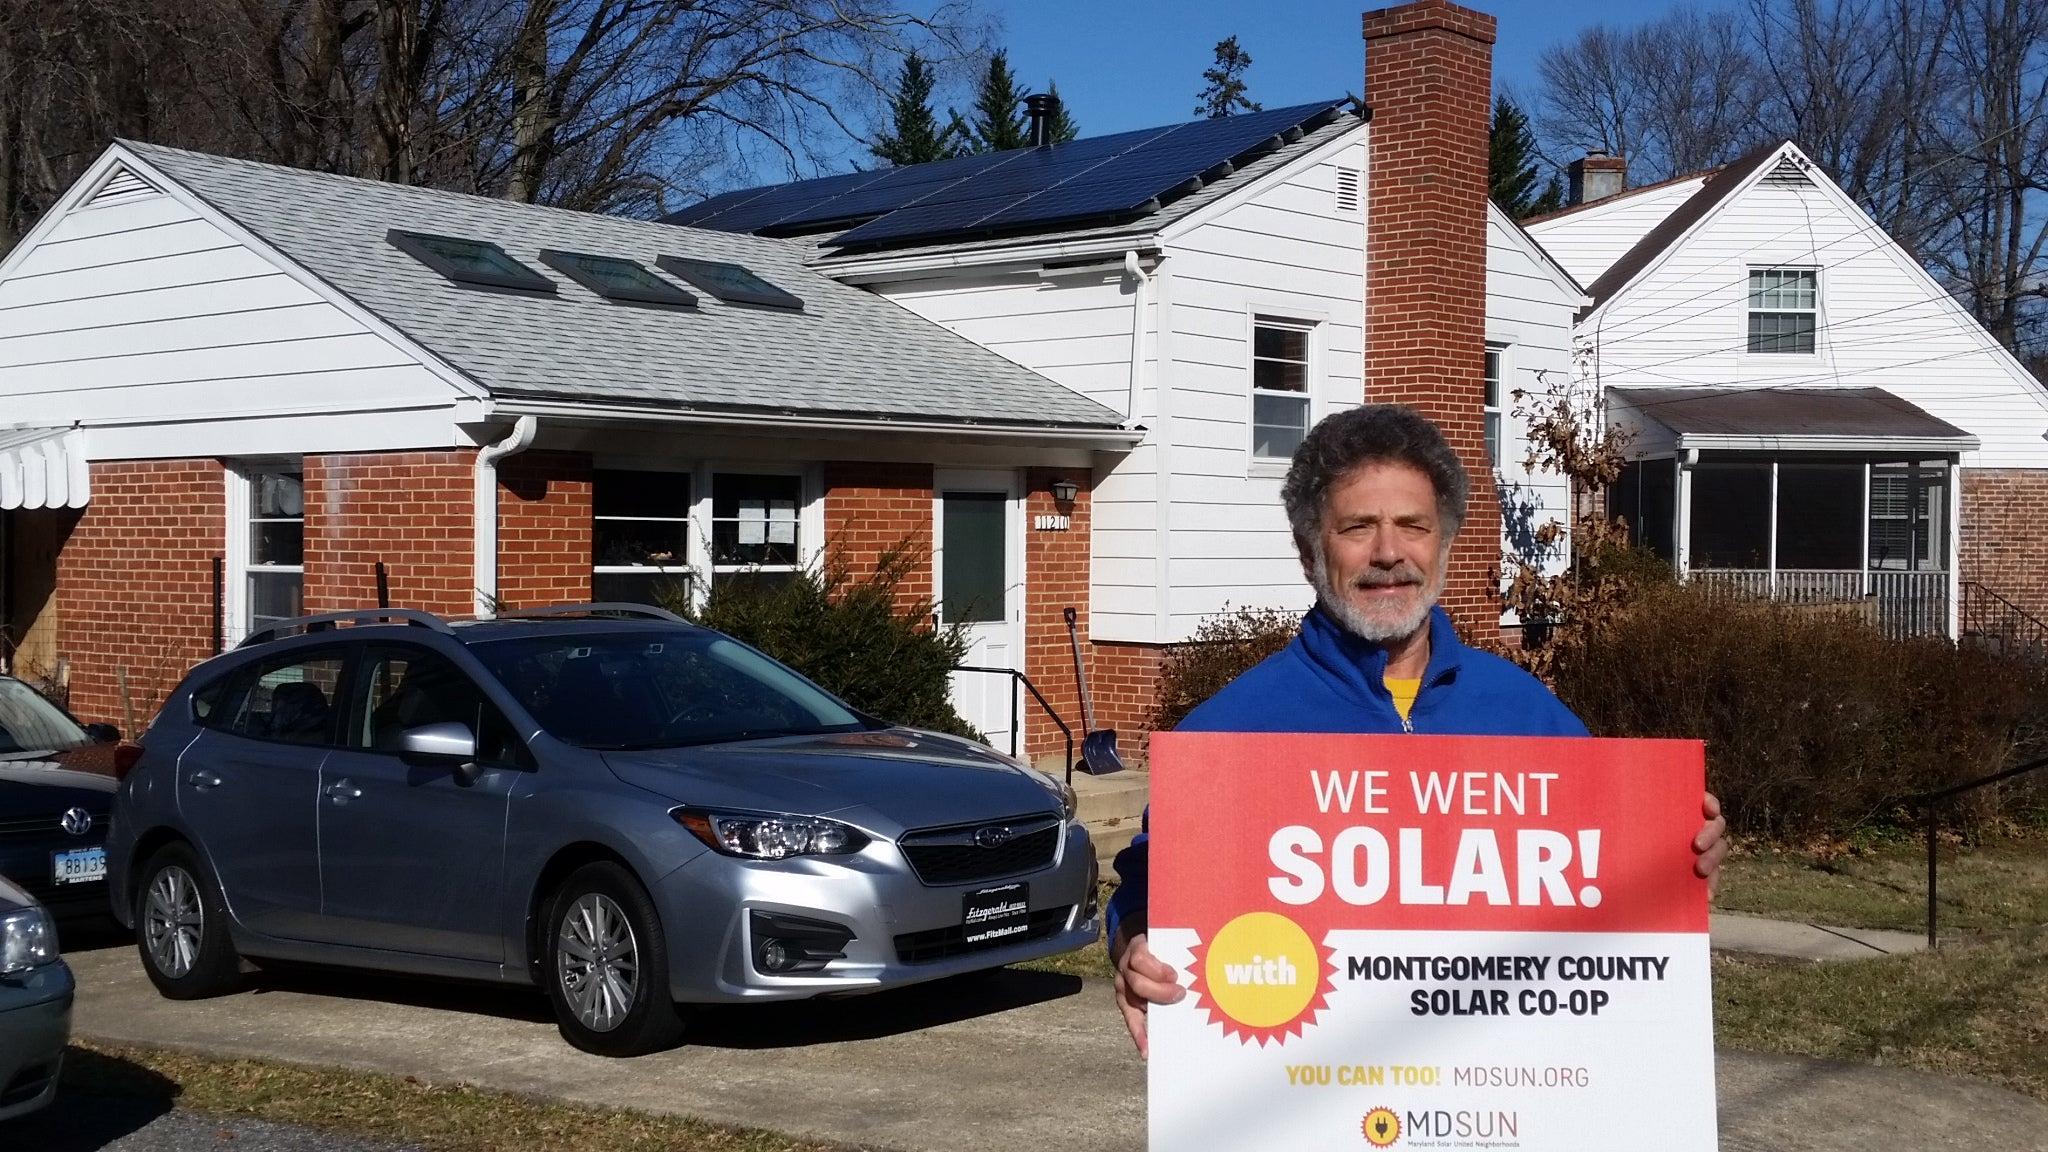 Louis Tenenbaum with his solar installation